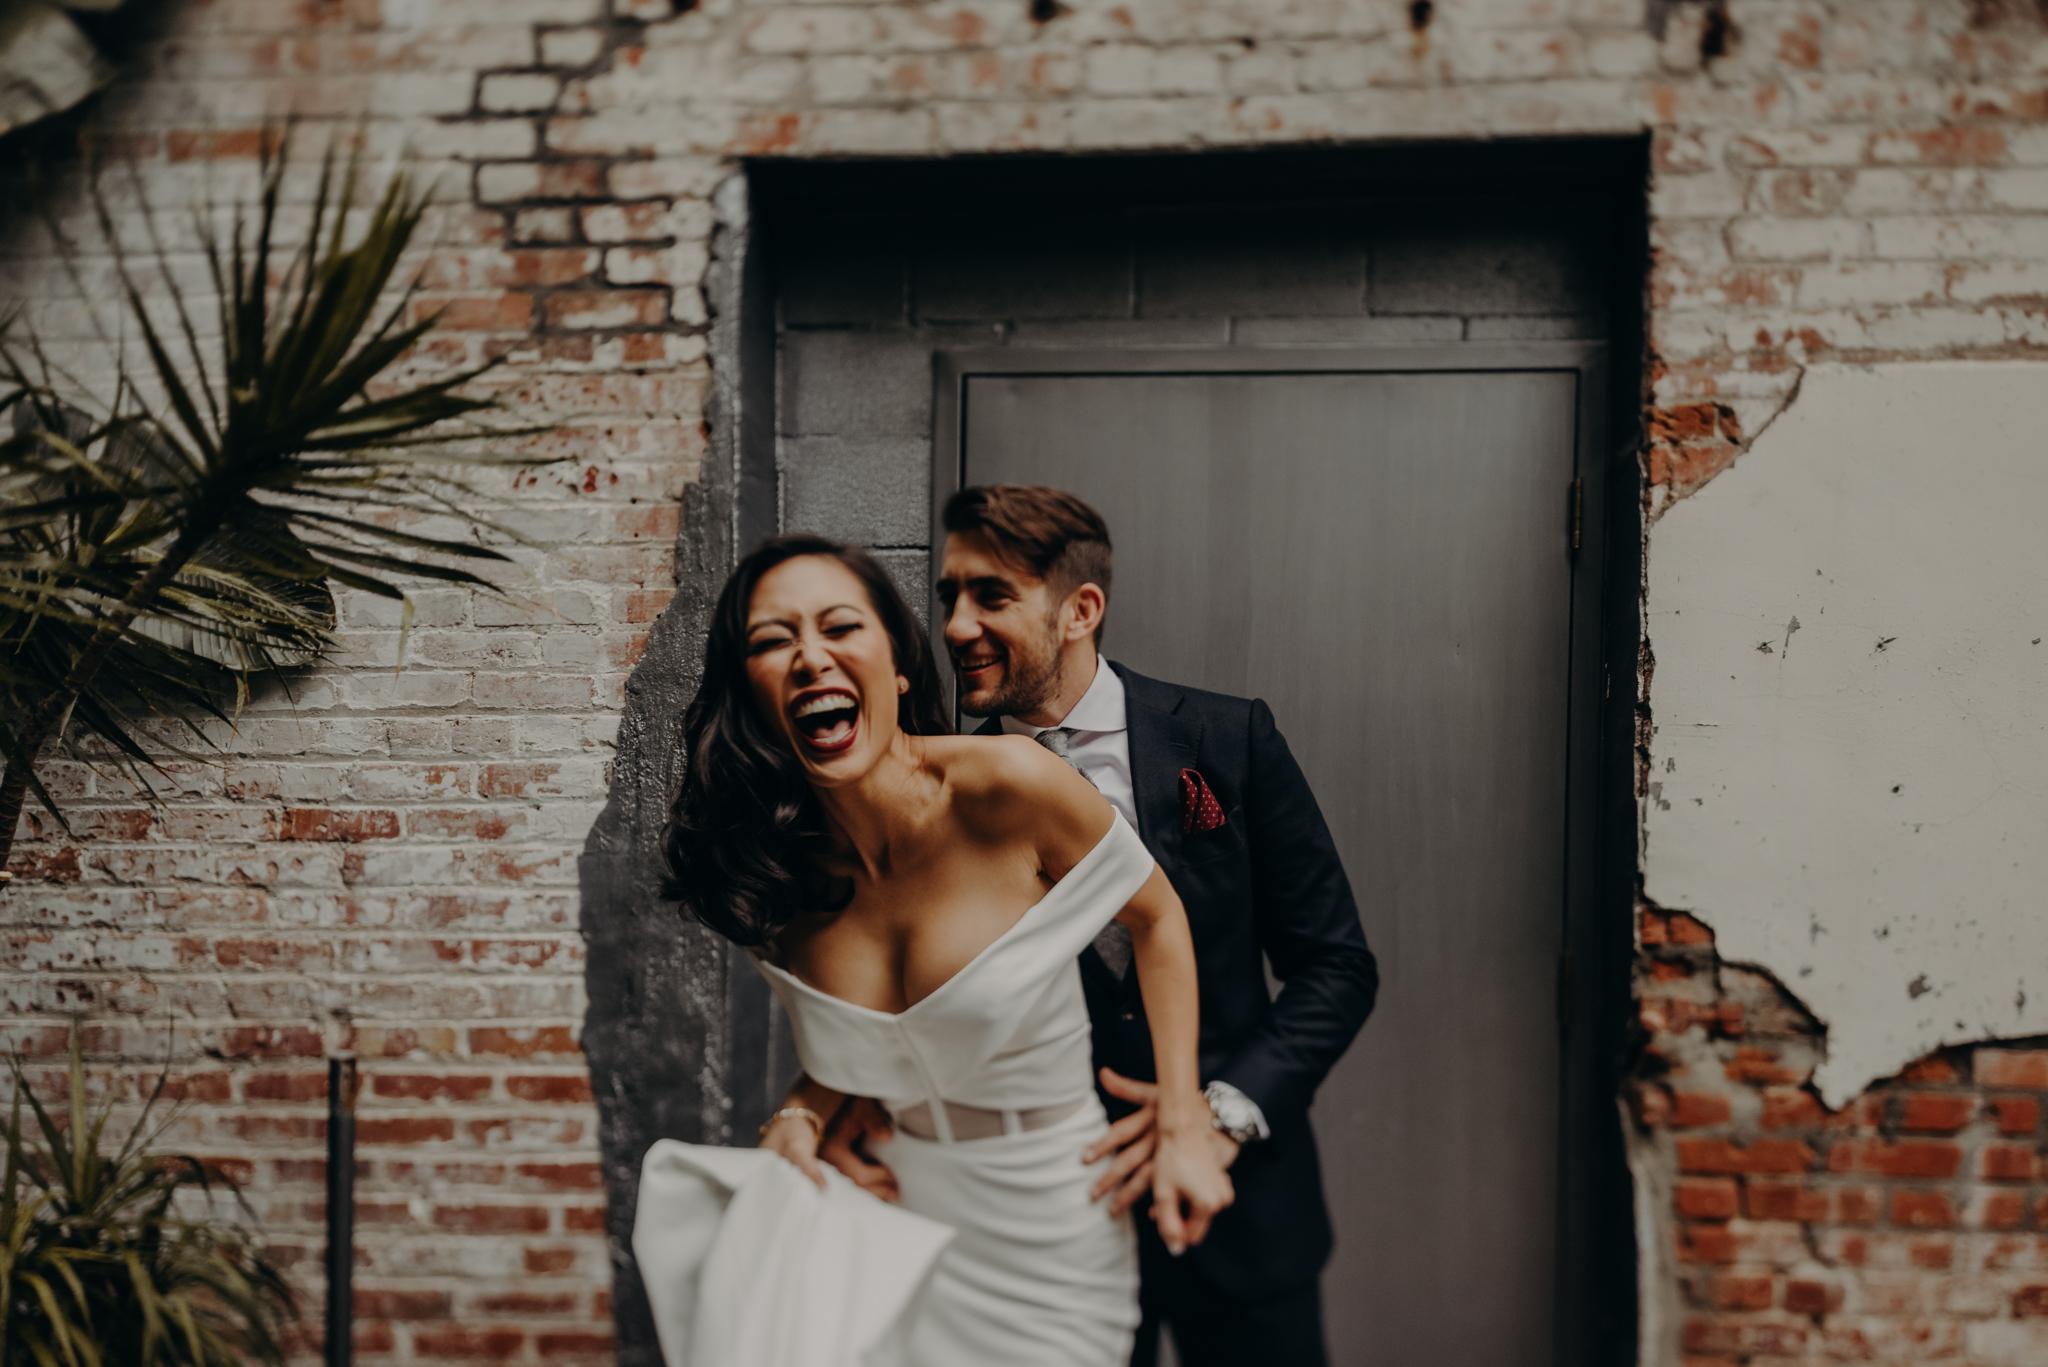 Wedding Photo LA - wedding photographer in los angeles - millwick wedding venue -isaiahandtaylor.com-056.jpg